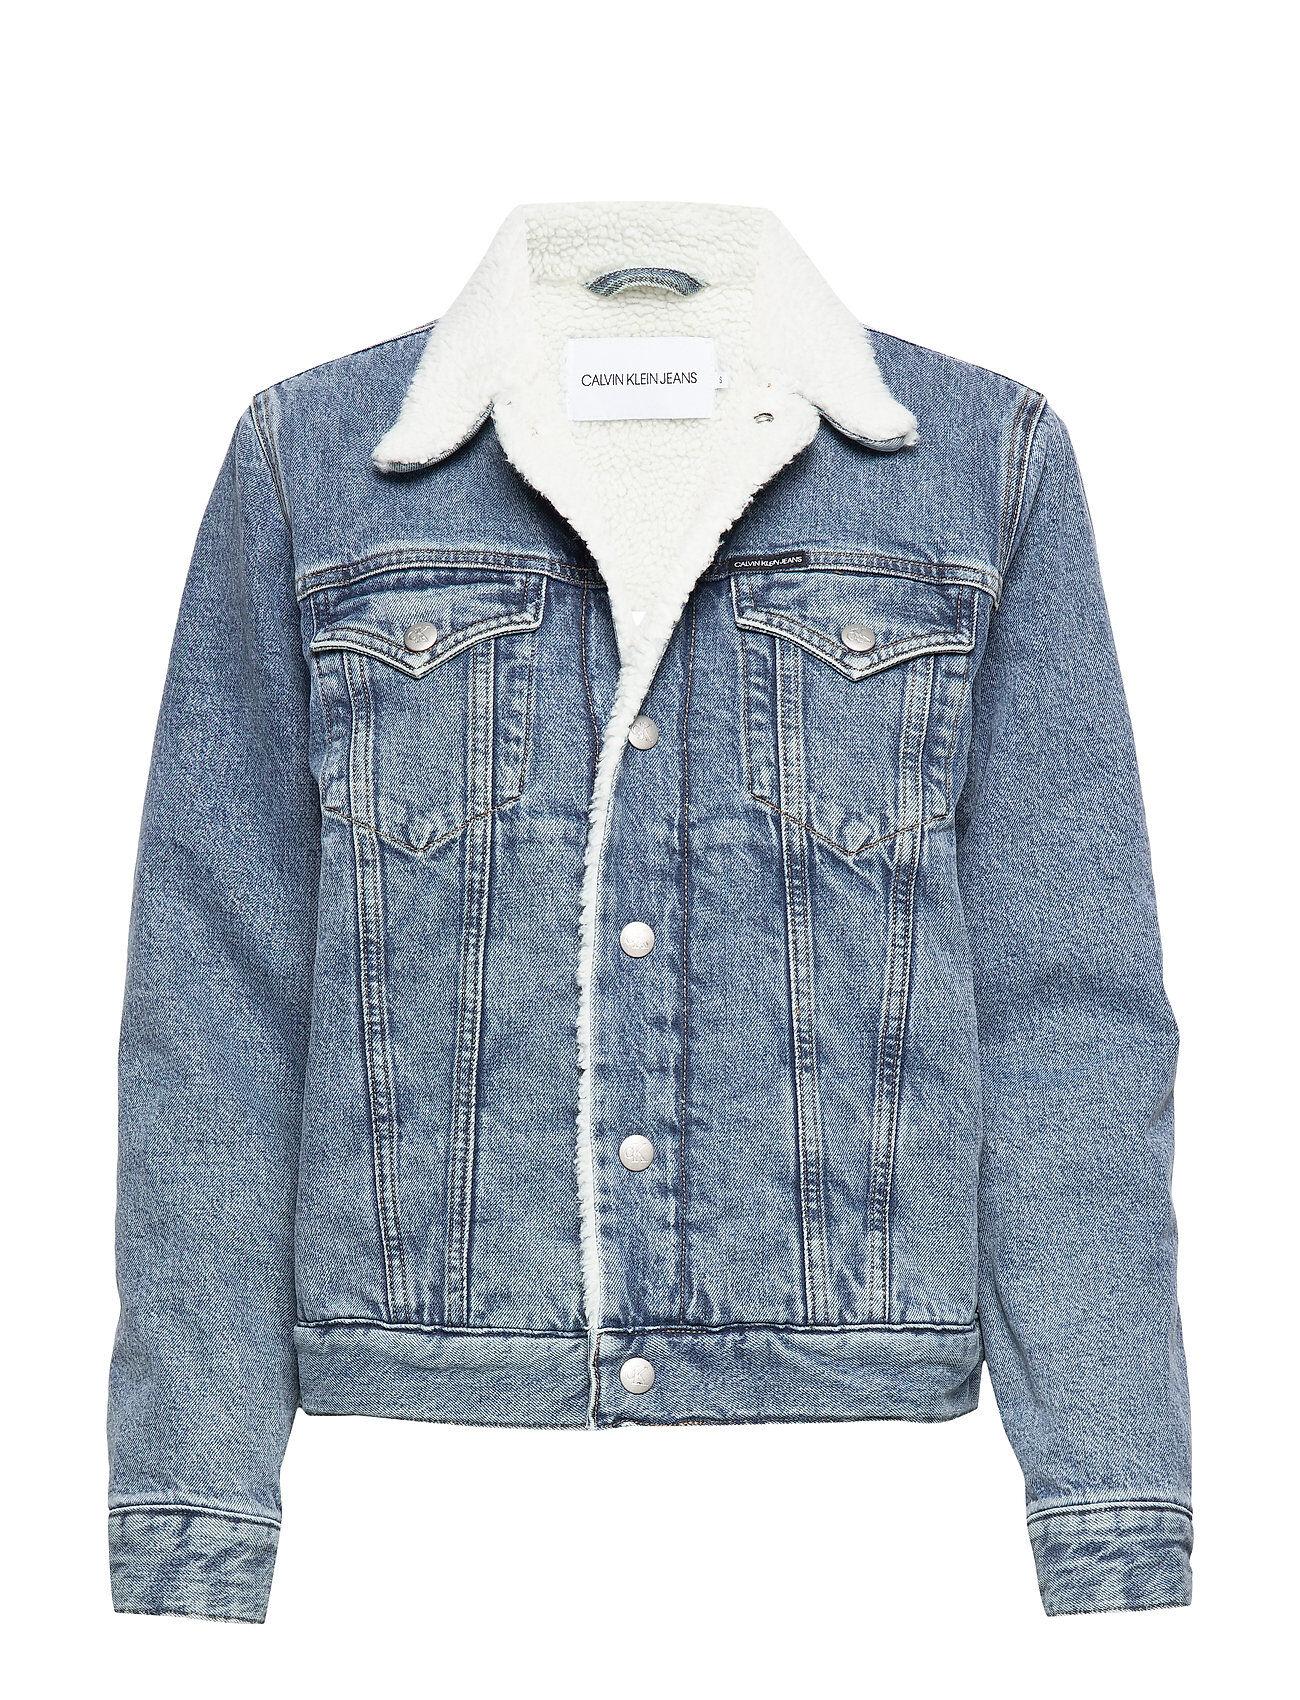 Image of Calvin Sherpa Foundation Denim Trucker Farkkutakki Denimtakki Sininen Calvin Klein Jeans